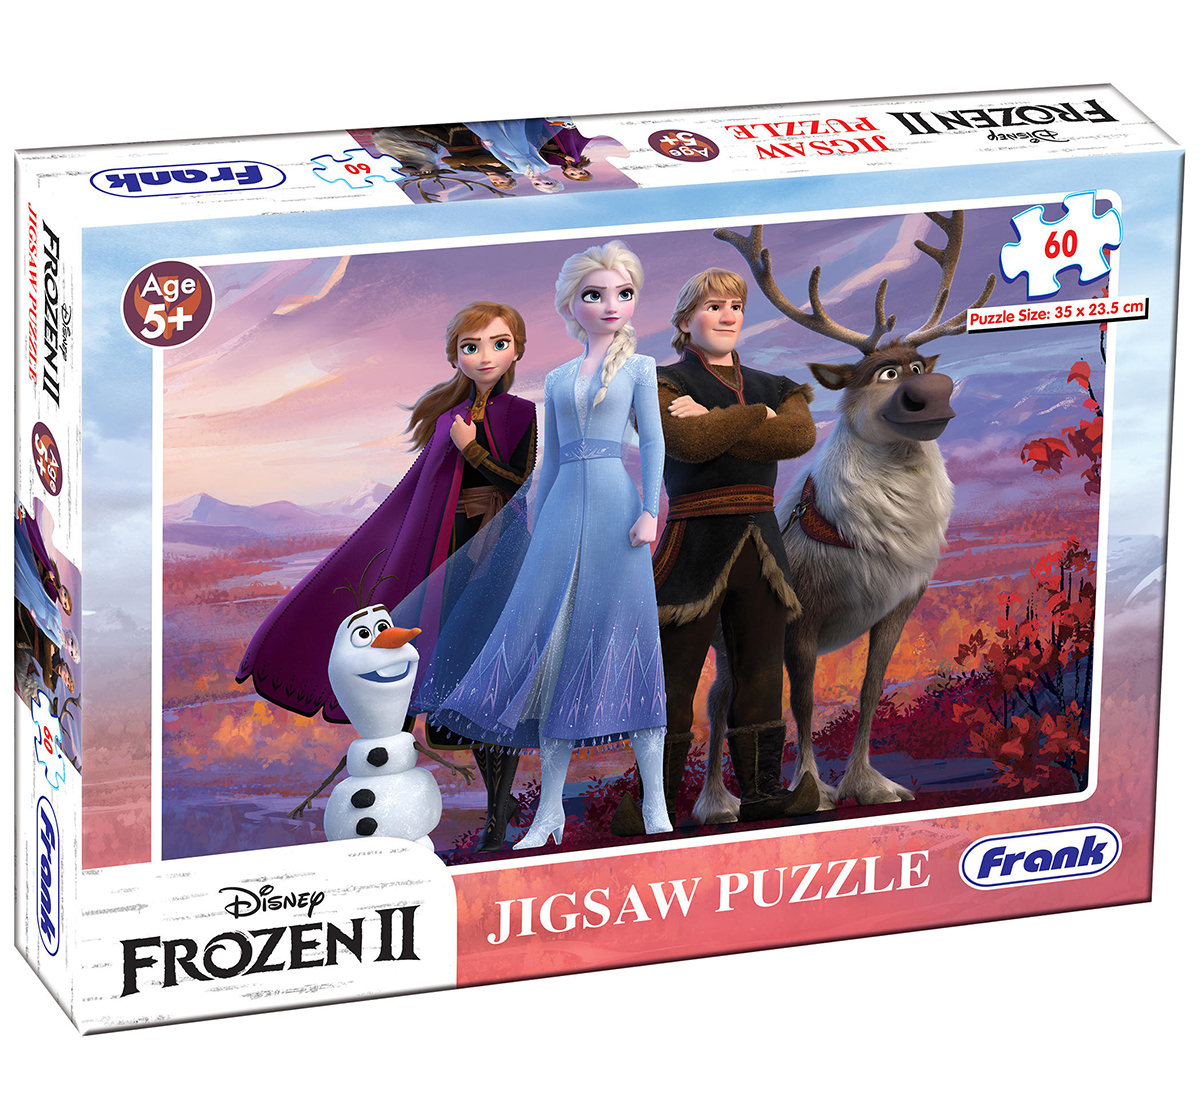 Frank |  Frank Frozen II 60 Pcs Puzzle for Kids age 5Y+